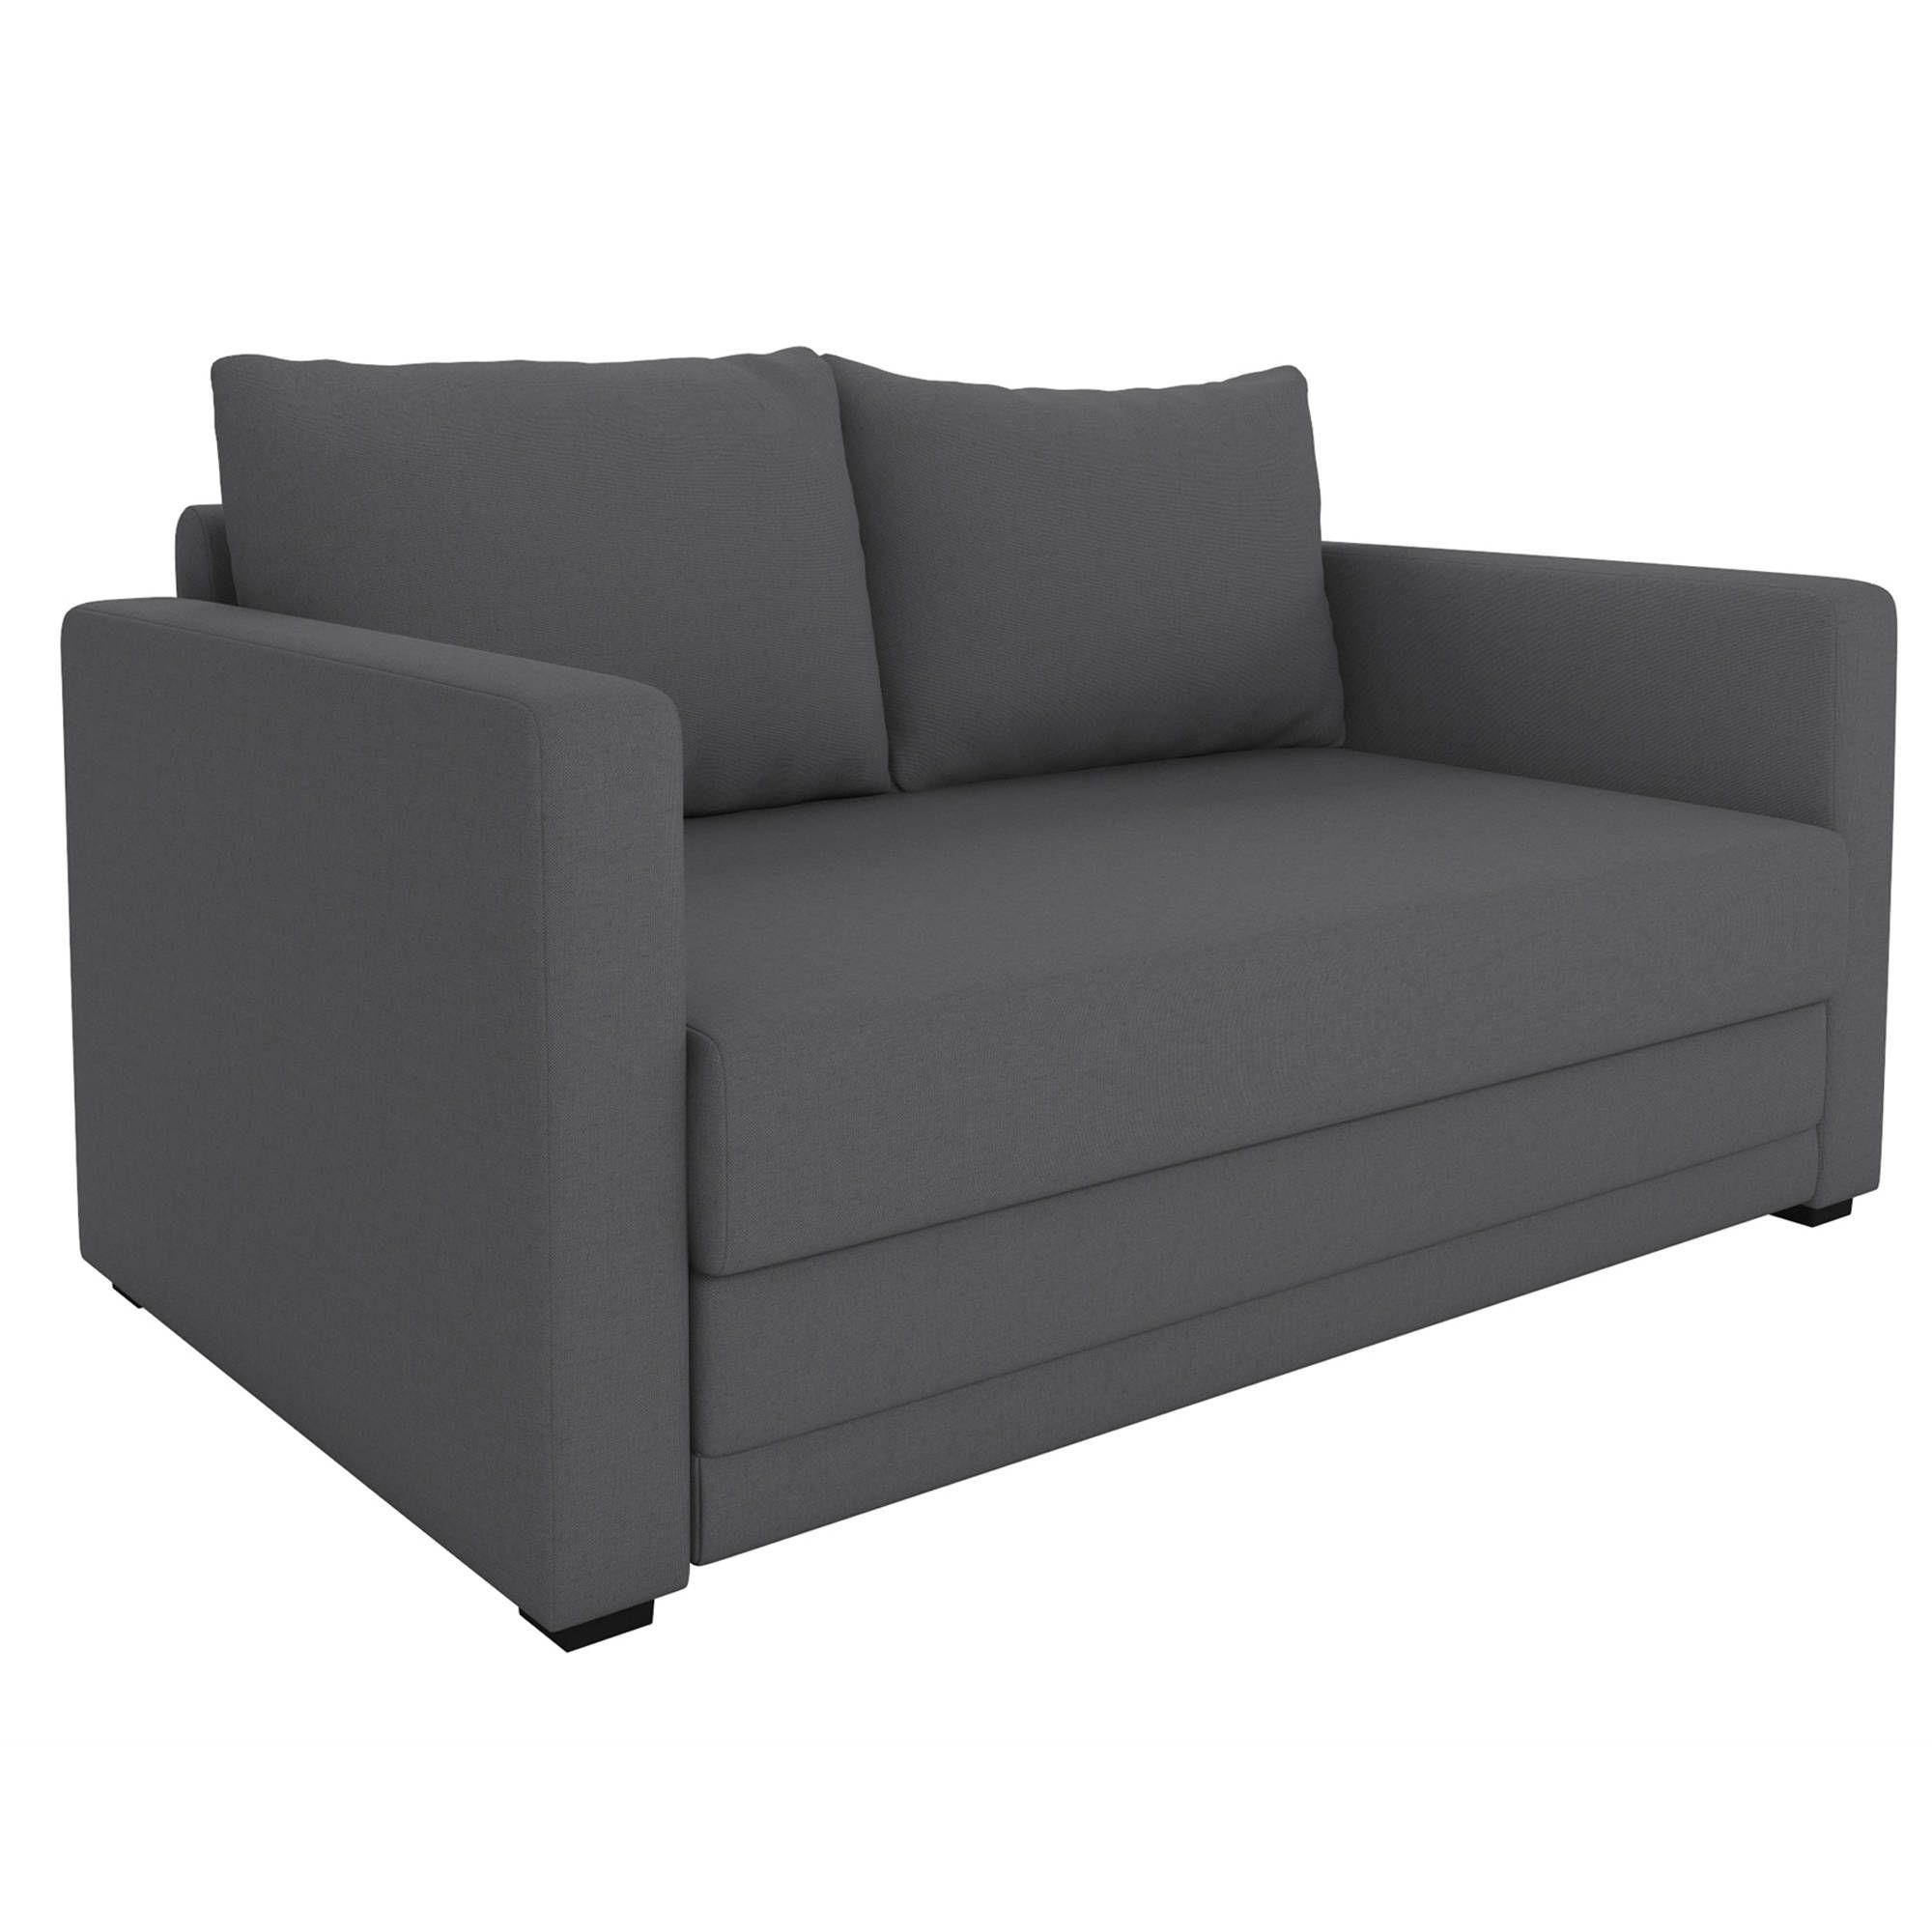 Sofa Klappbar Stuhl Bett Kleine Doppel Sofa Bett Einzel Bett Stuhl